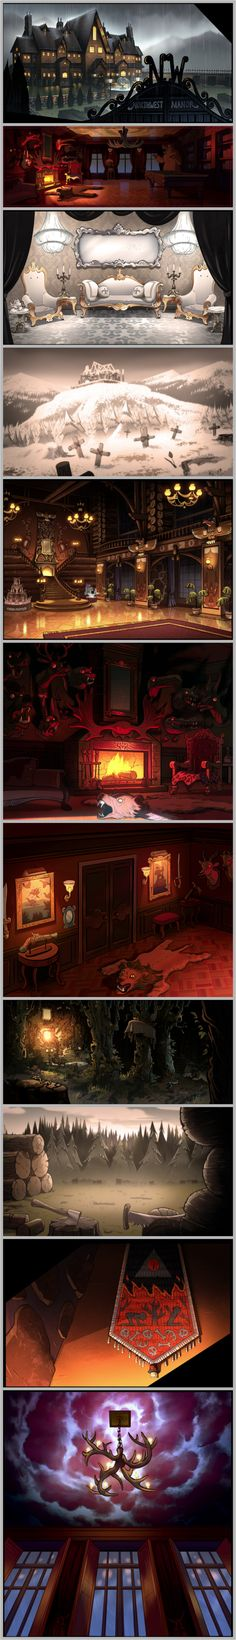 Gravity Falls -- A Tour of Northwest Manor. Art Direction: Ian Worrel. Designed by: Alex Chechik, Janine Chang, Matthias Bauer, Sun Jae Lee. Paintings by: Jeffrey Thompson, Matthias Bauer, Paul Tsui, Samantha Kallis, Manddy Wyckens